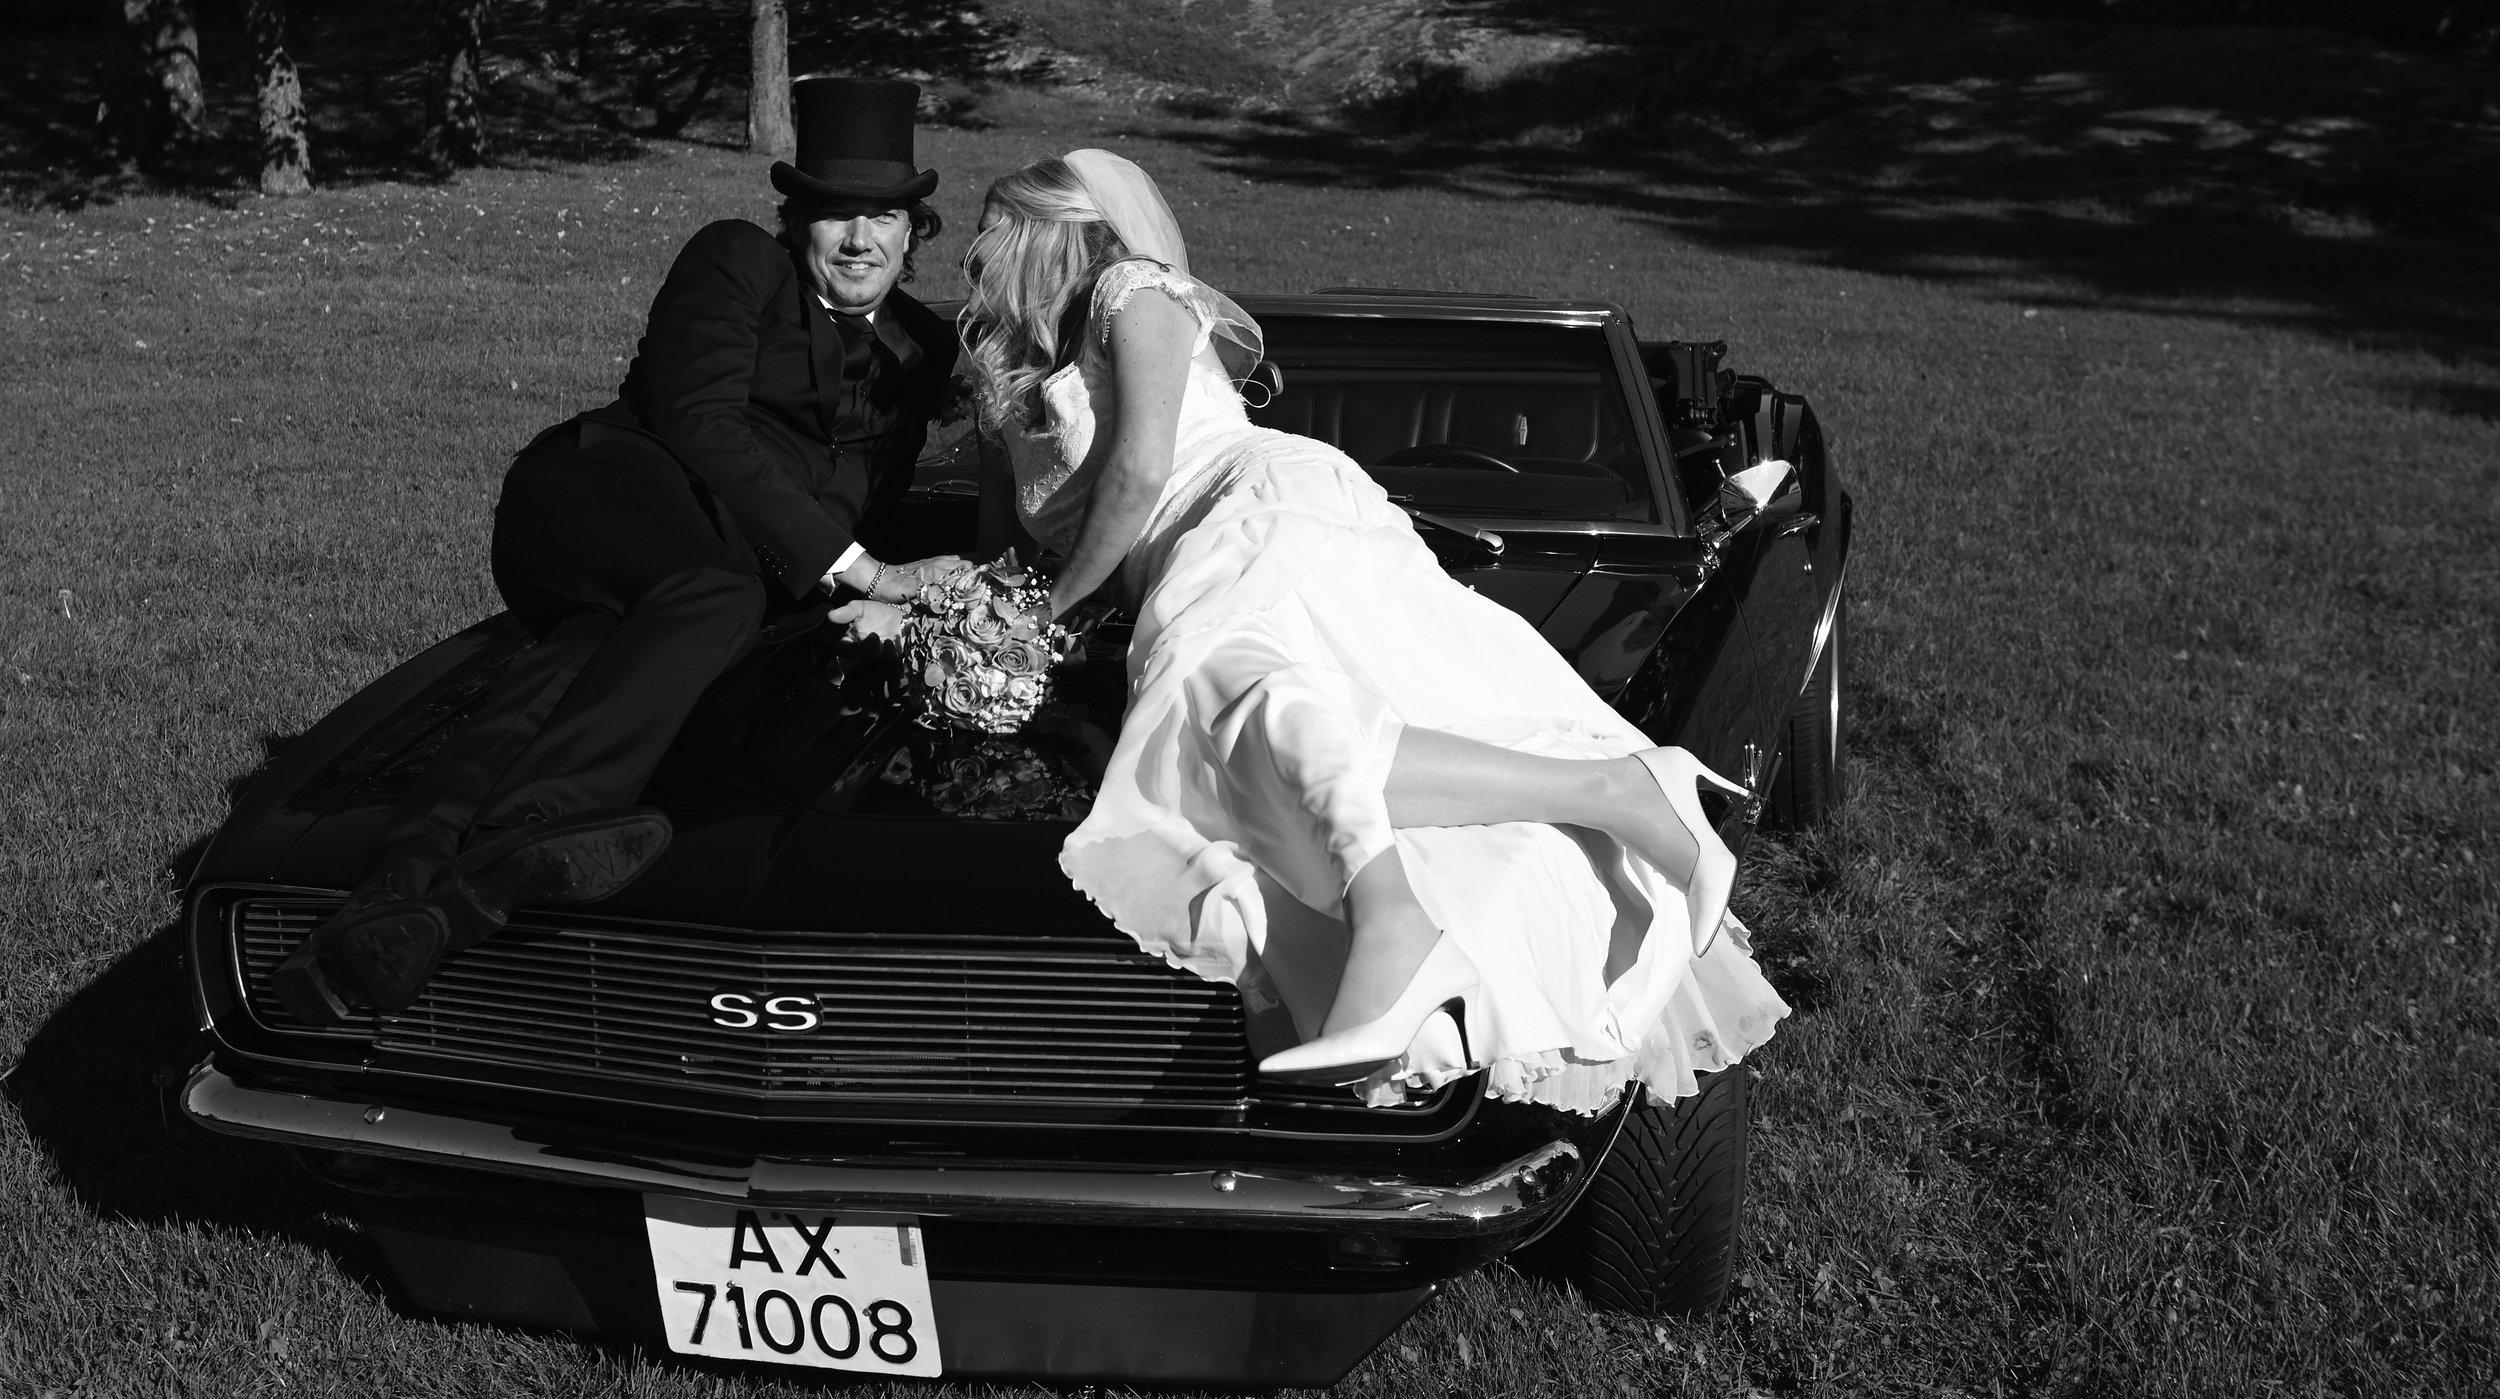 lone bryllup 239.jpg